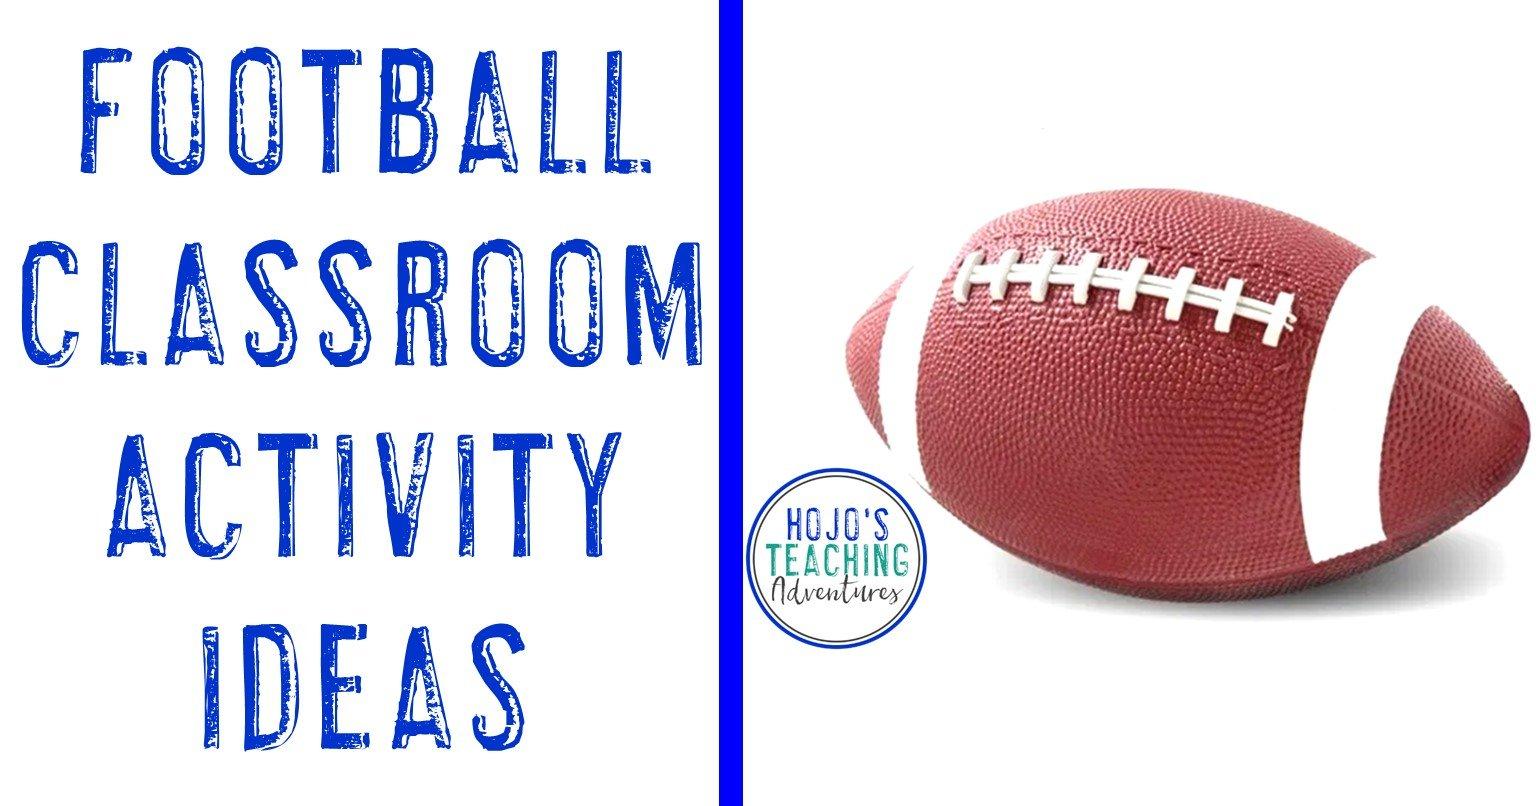 Football Classroom Activity Ideas with a football image